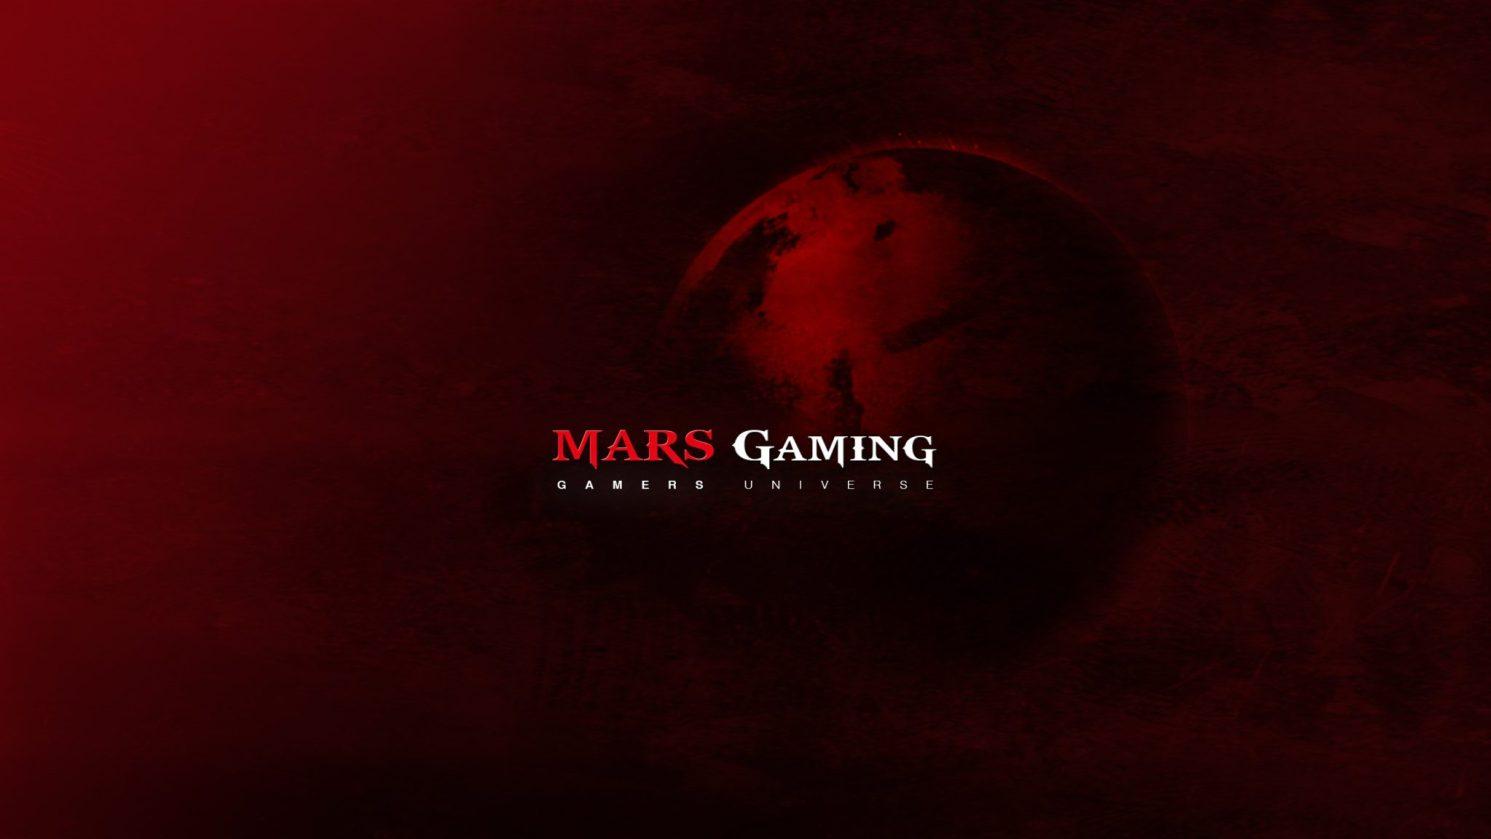 MARS GAMING WALLPAPER